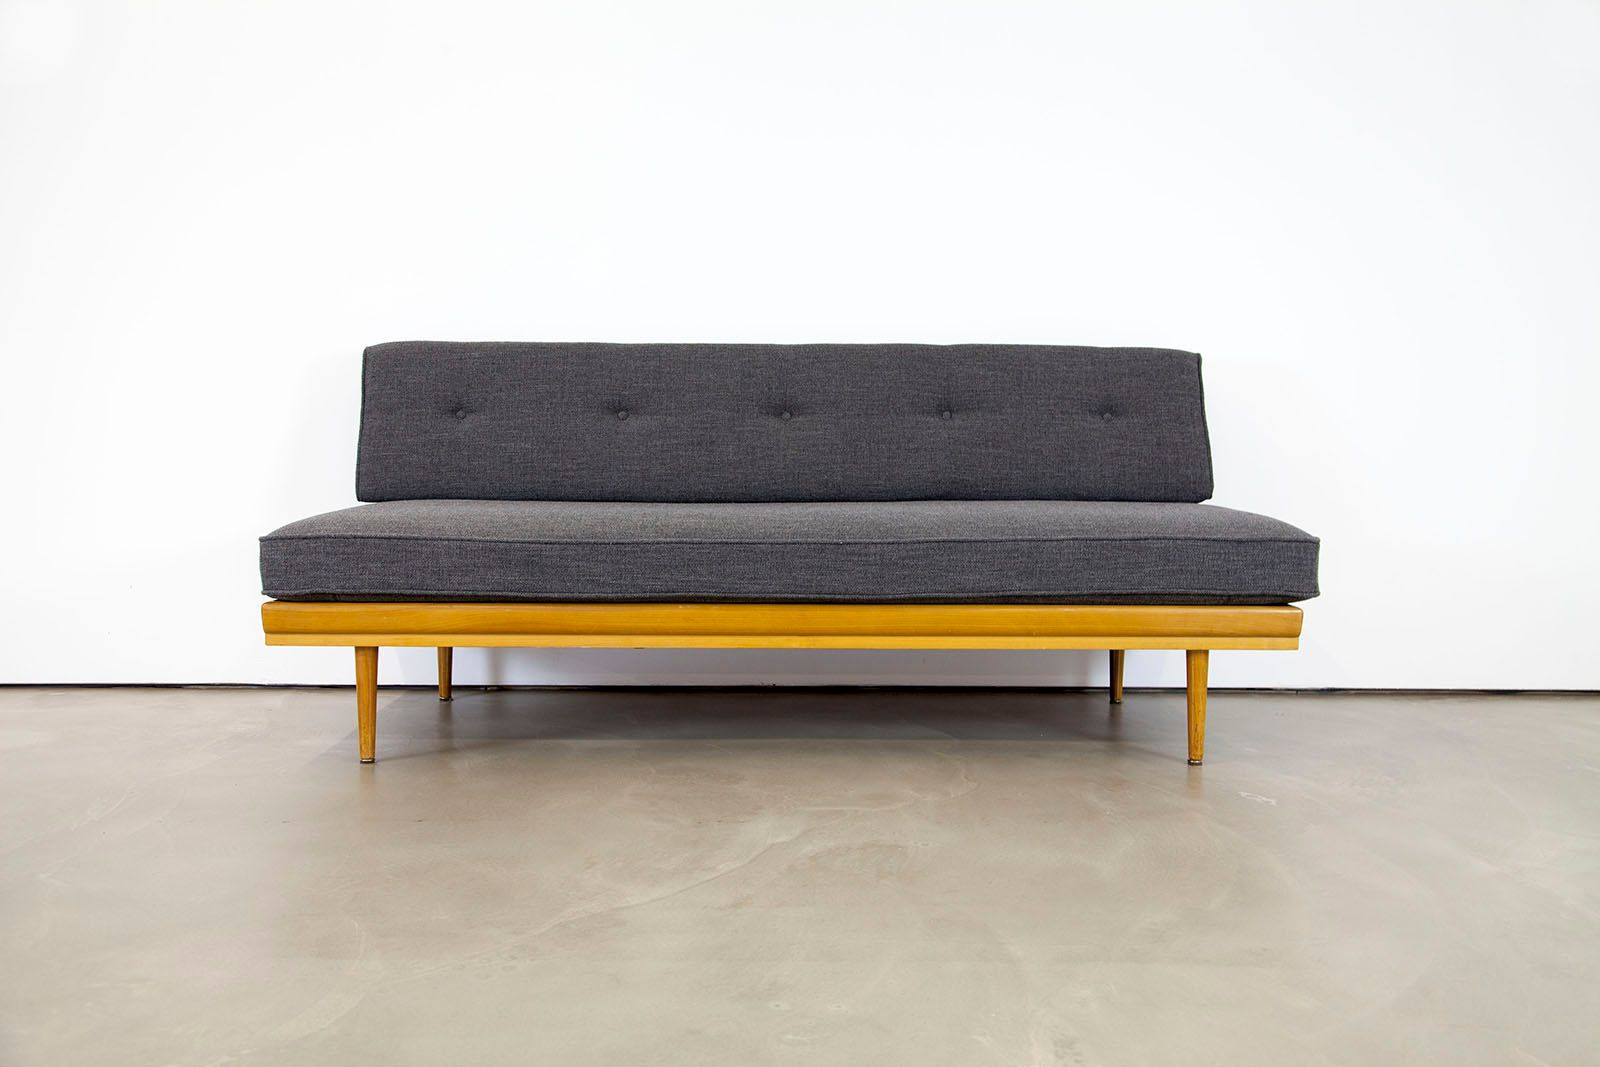 modernes mid century sofa 1950er bei pamono kaufen. Black Bedroom Furniture Sets. Home Design Ideas